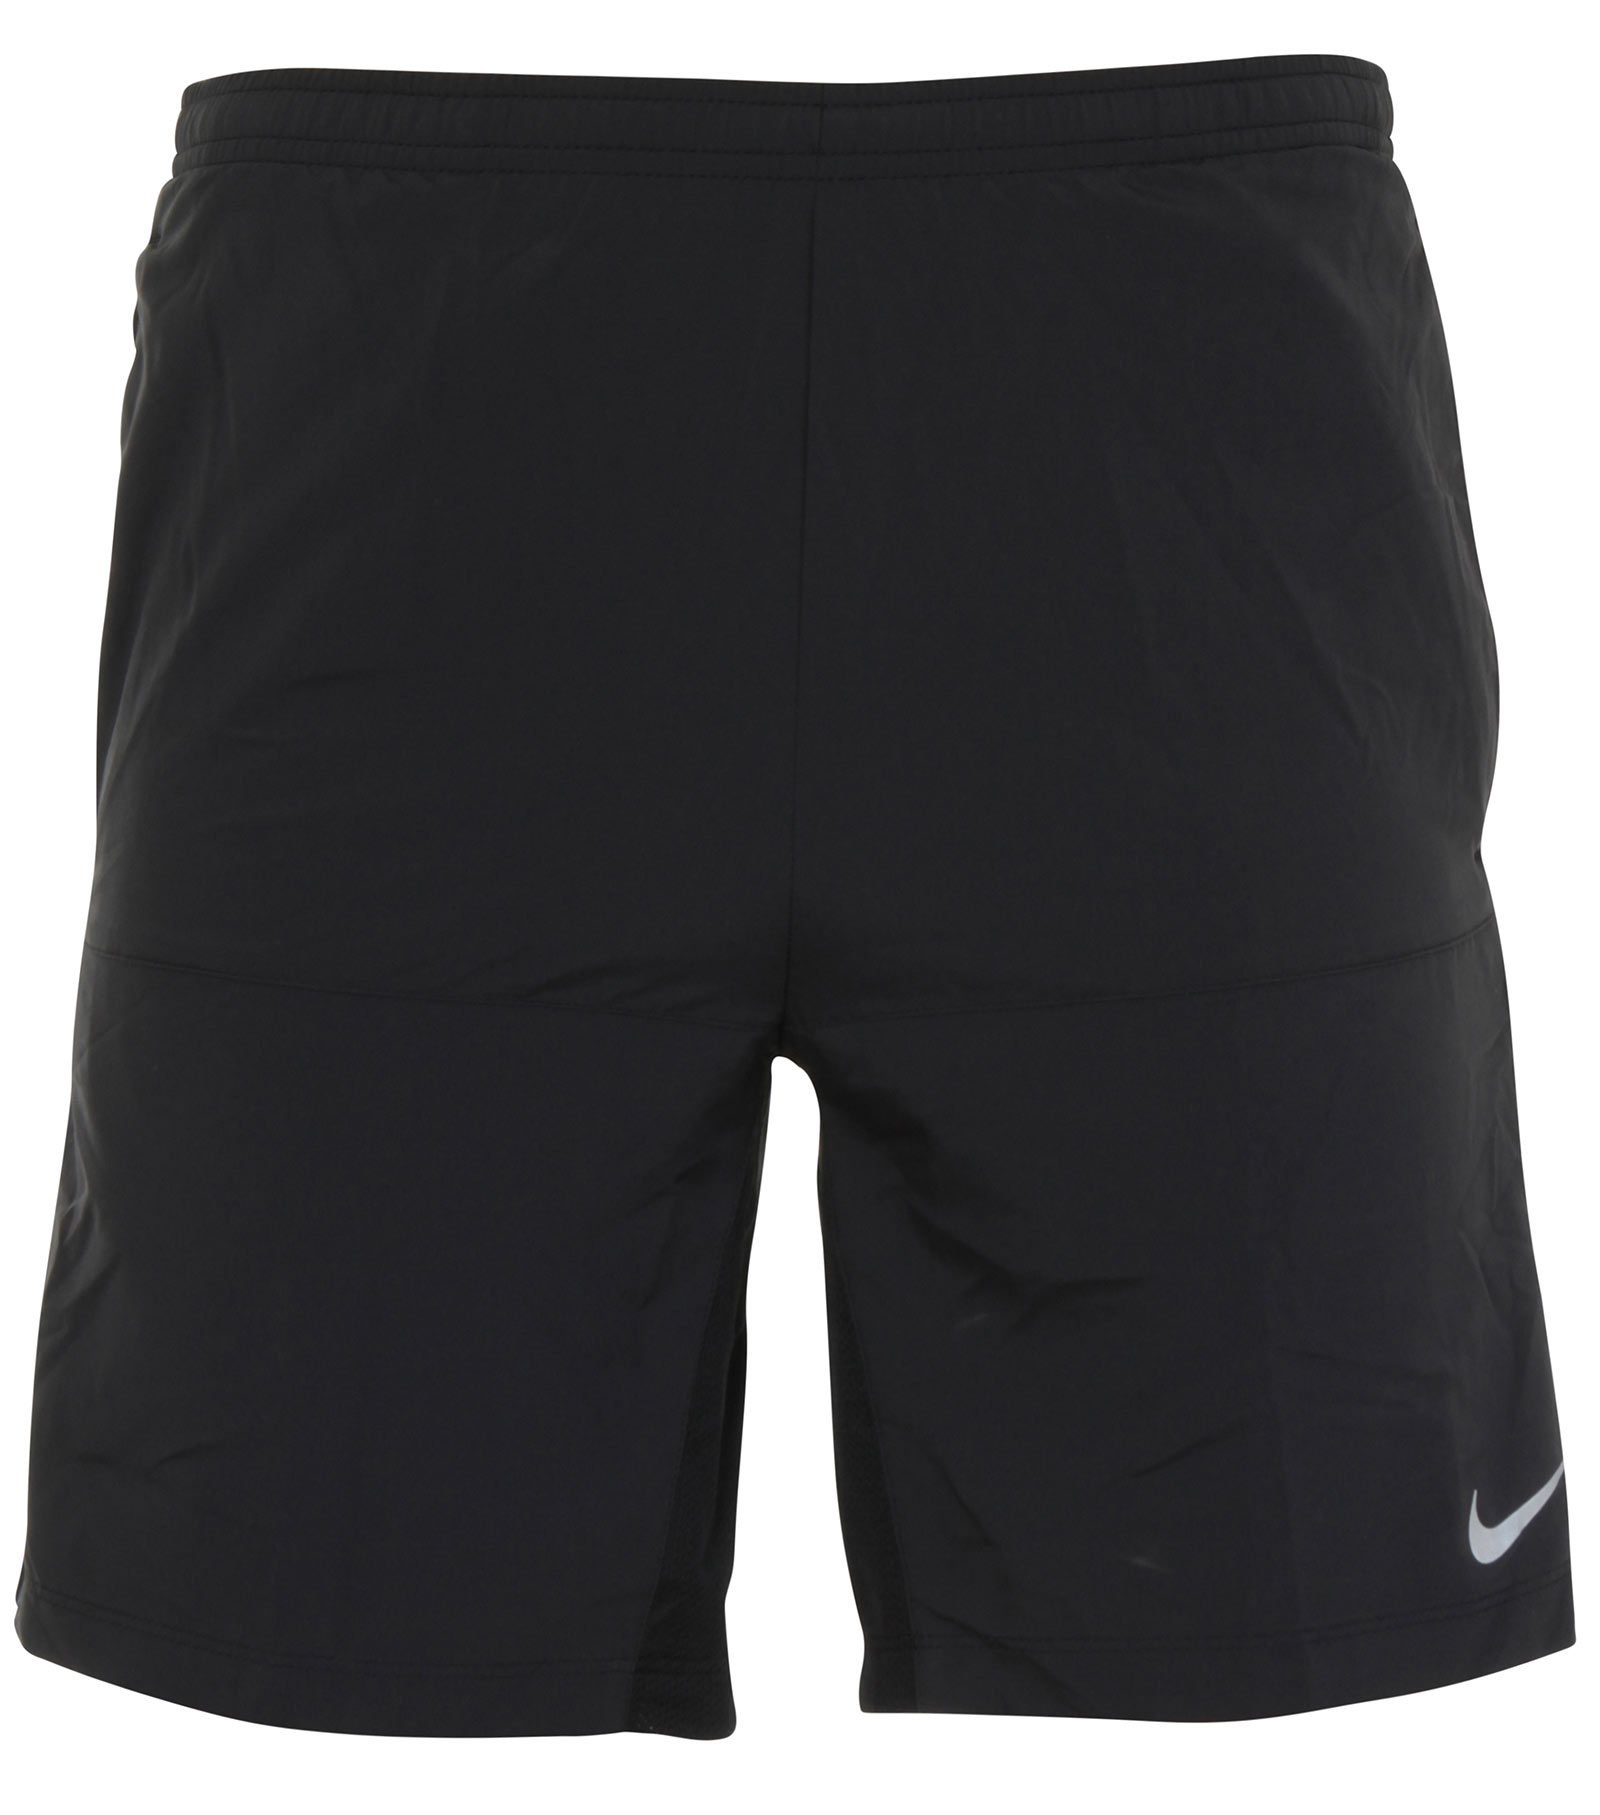 nike men's 7 flex distance running shorts